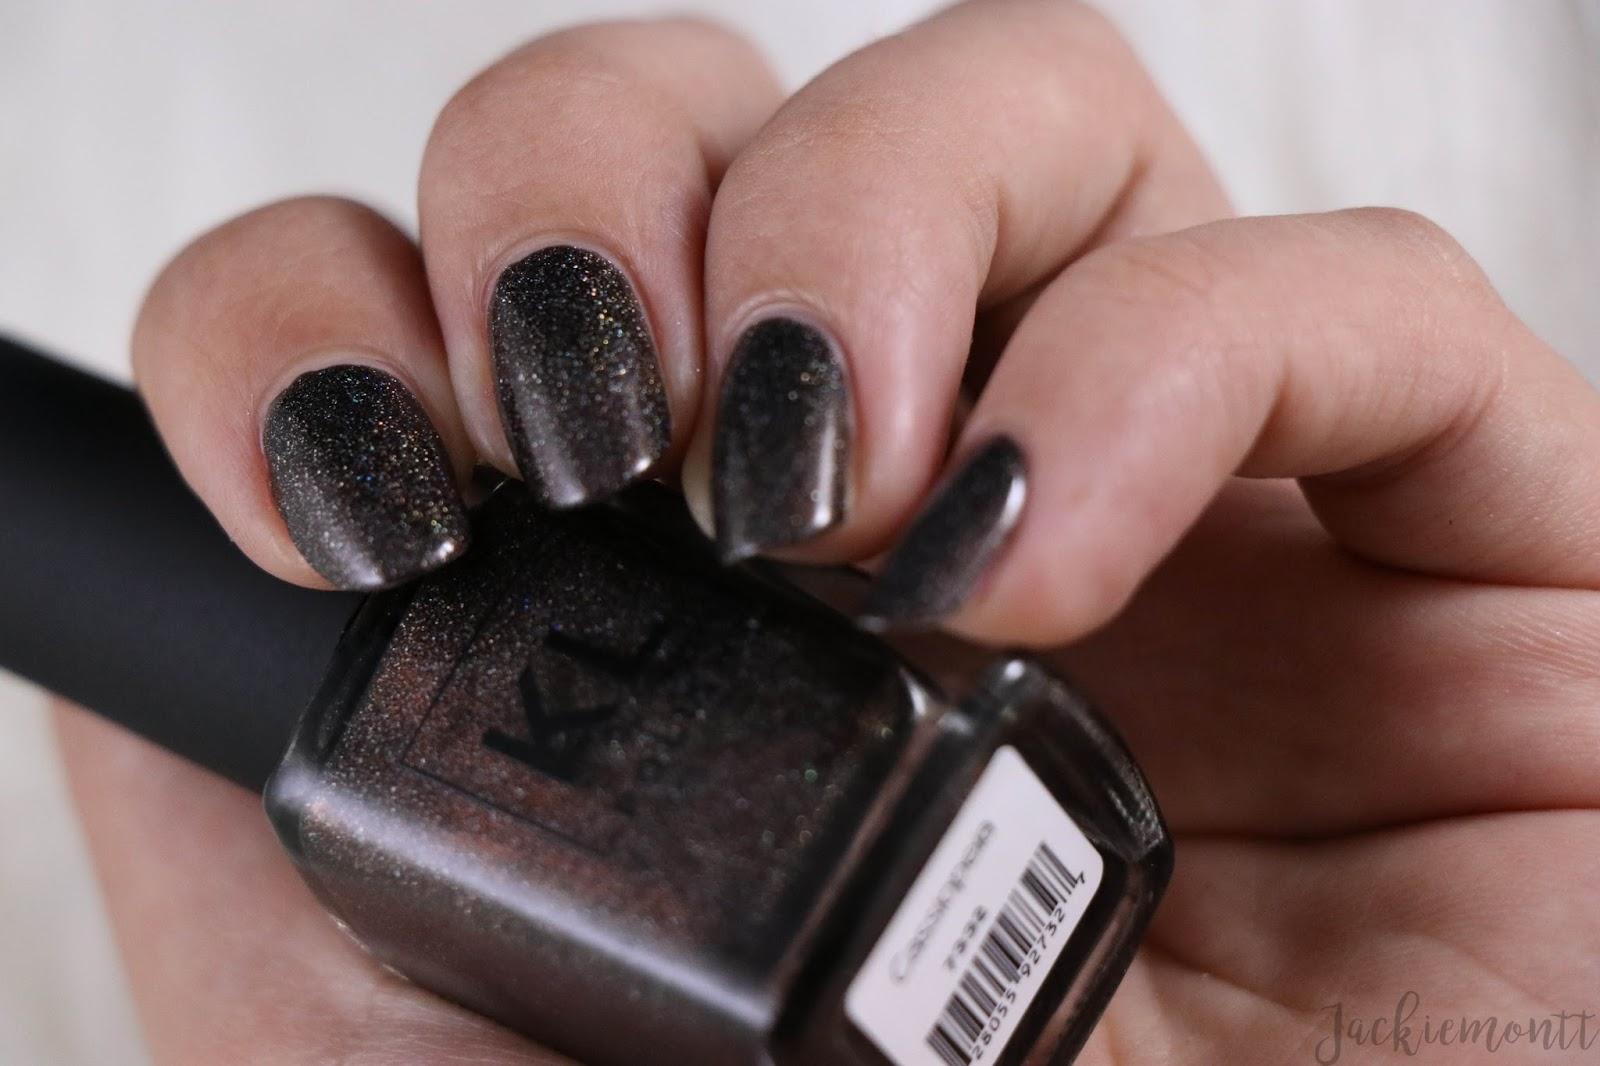 KL Polish Winter Glamourland, Black & White + Das Esspensive XXVI ...